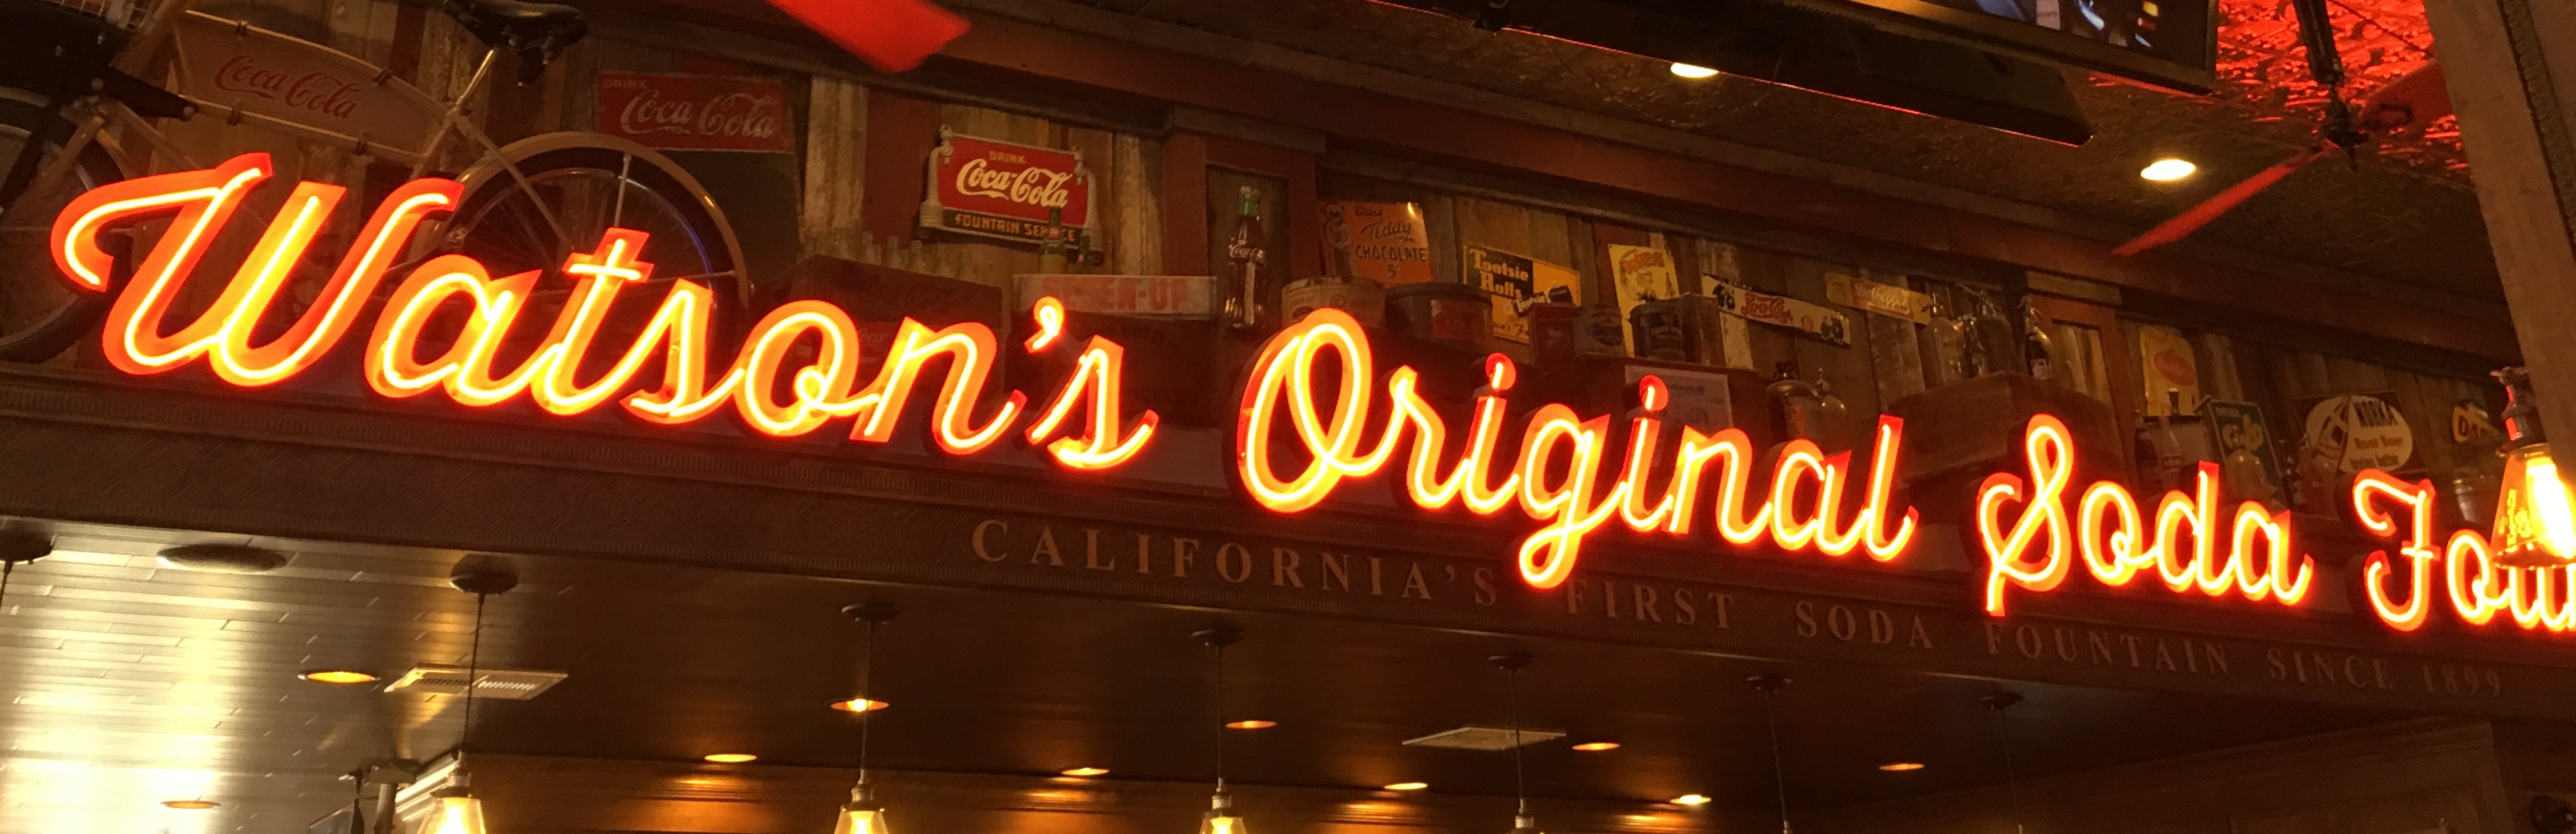 Watson\'s is nostalgia and great food – ORANGE COUNTY TRIBUNE